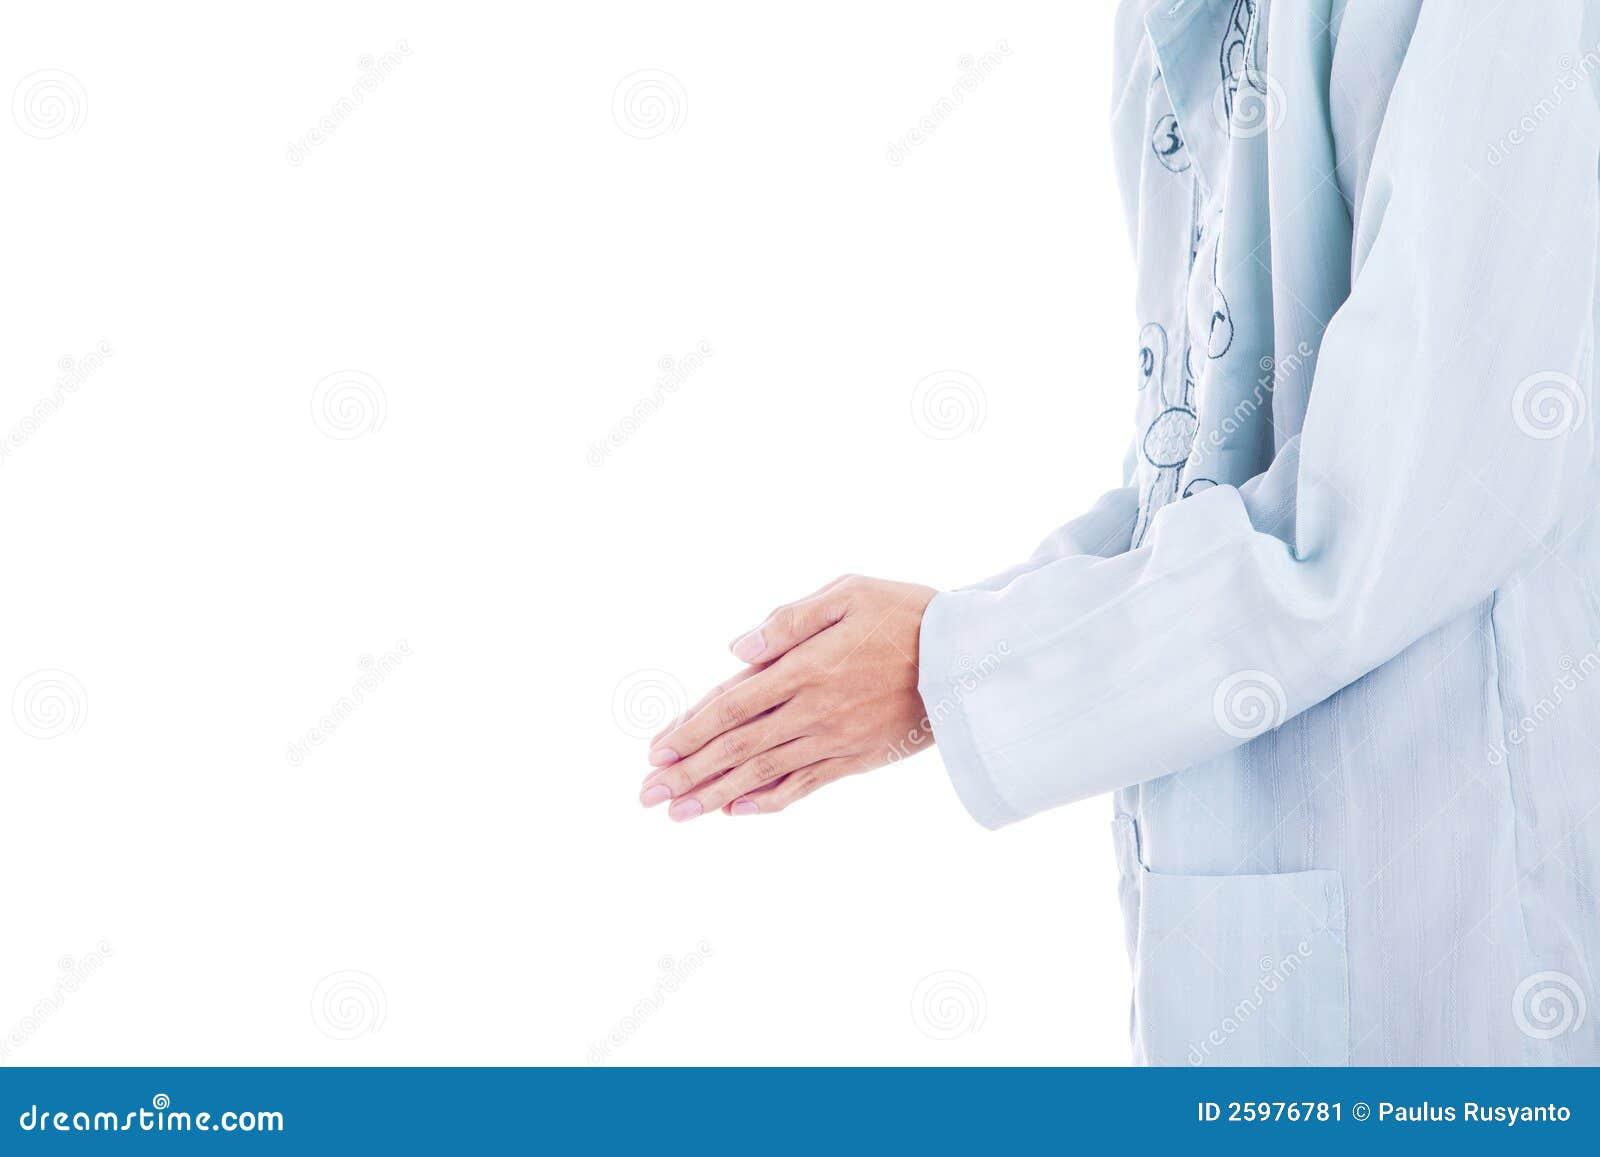 Forgiving hand gesture